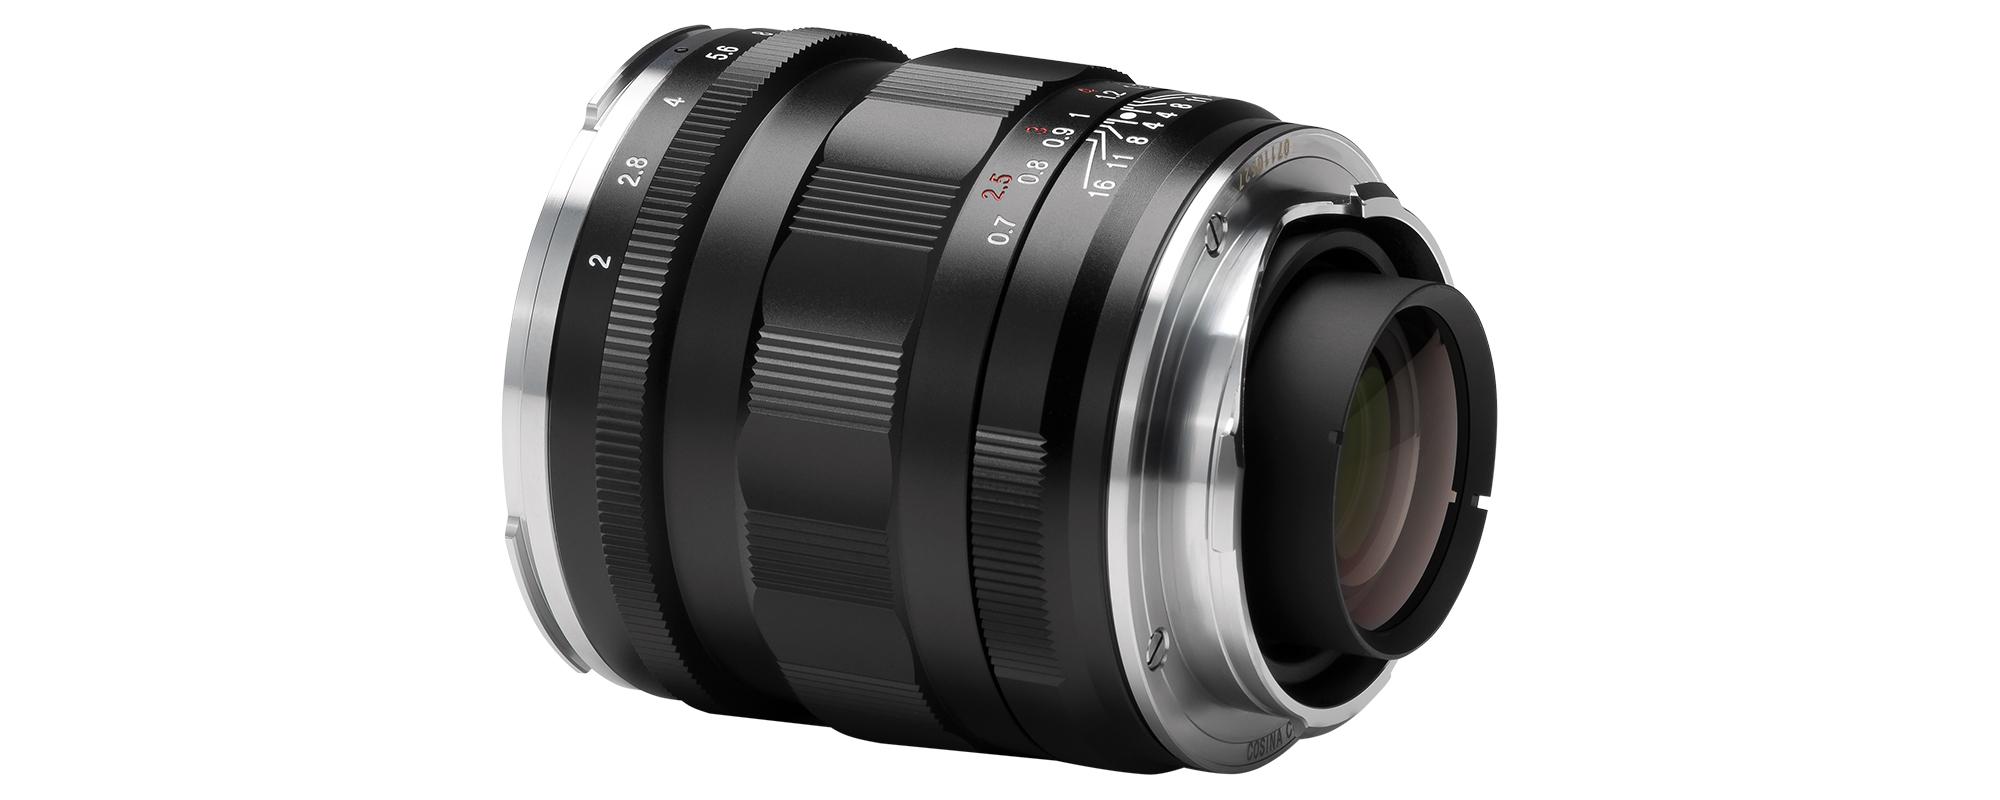 Voigtlander APO Lanthar 50 mm f/2.0 lens with Leica M bayonet